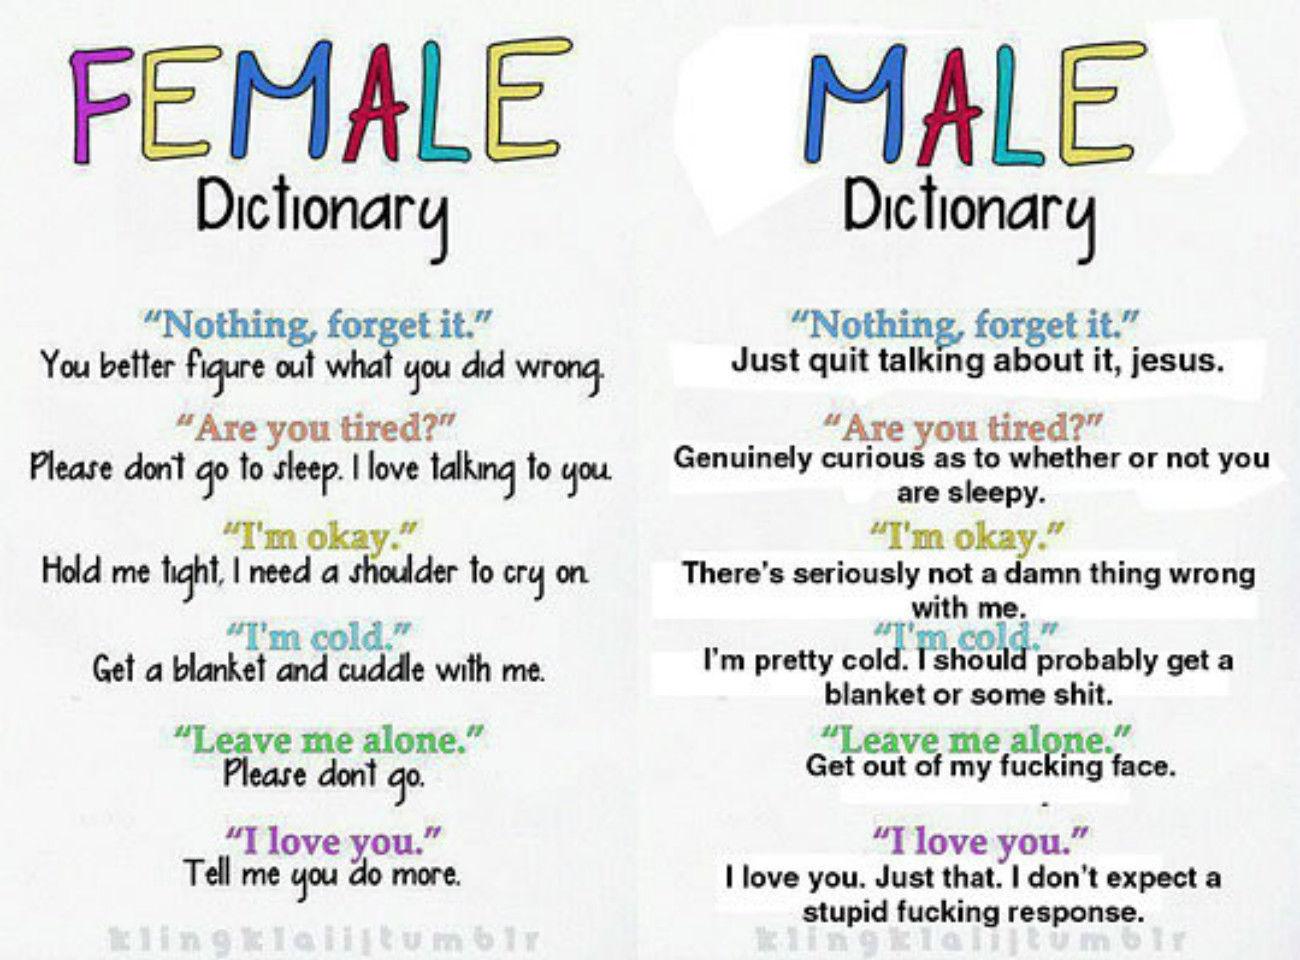 I need a female